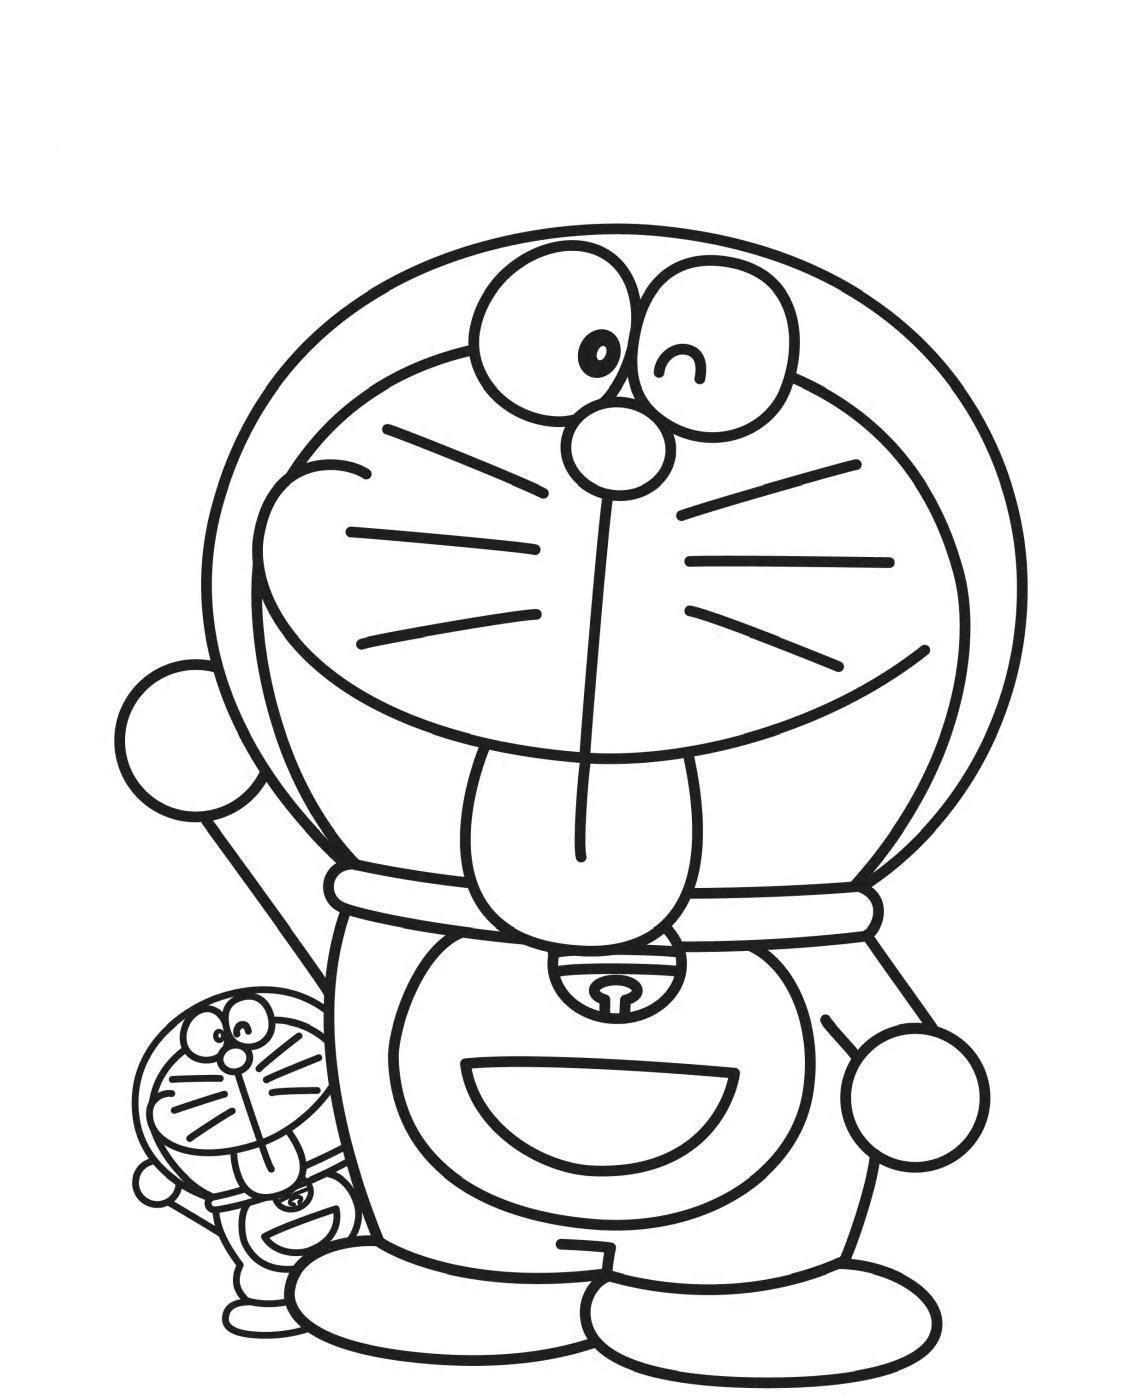 Doraemon Coloring Pages Best Coloring Pages For Kids Doraemon Cartoon Doraemon Cartoon Coloring Pages